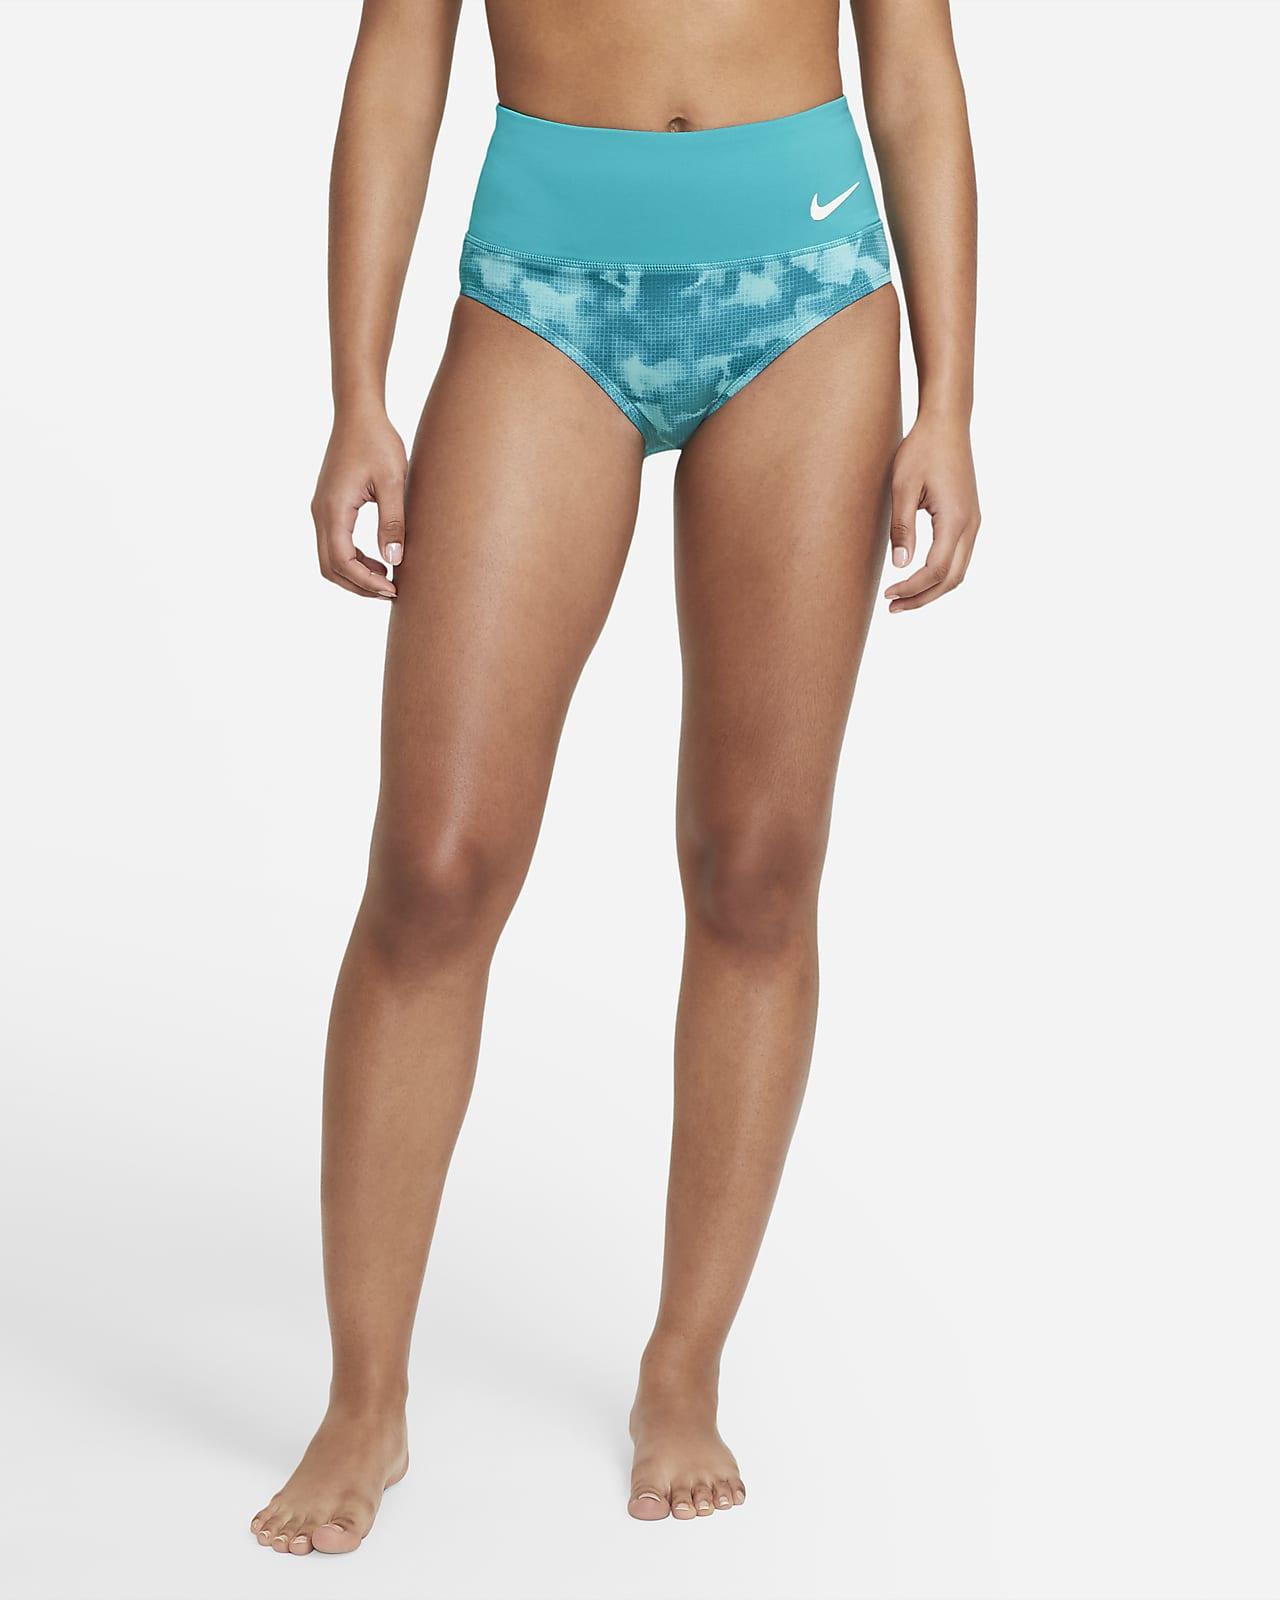 Nike Women's High-Waist Swim Bottom